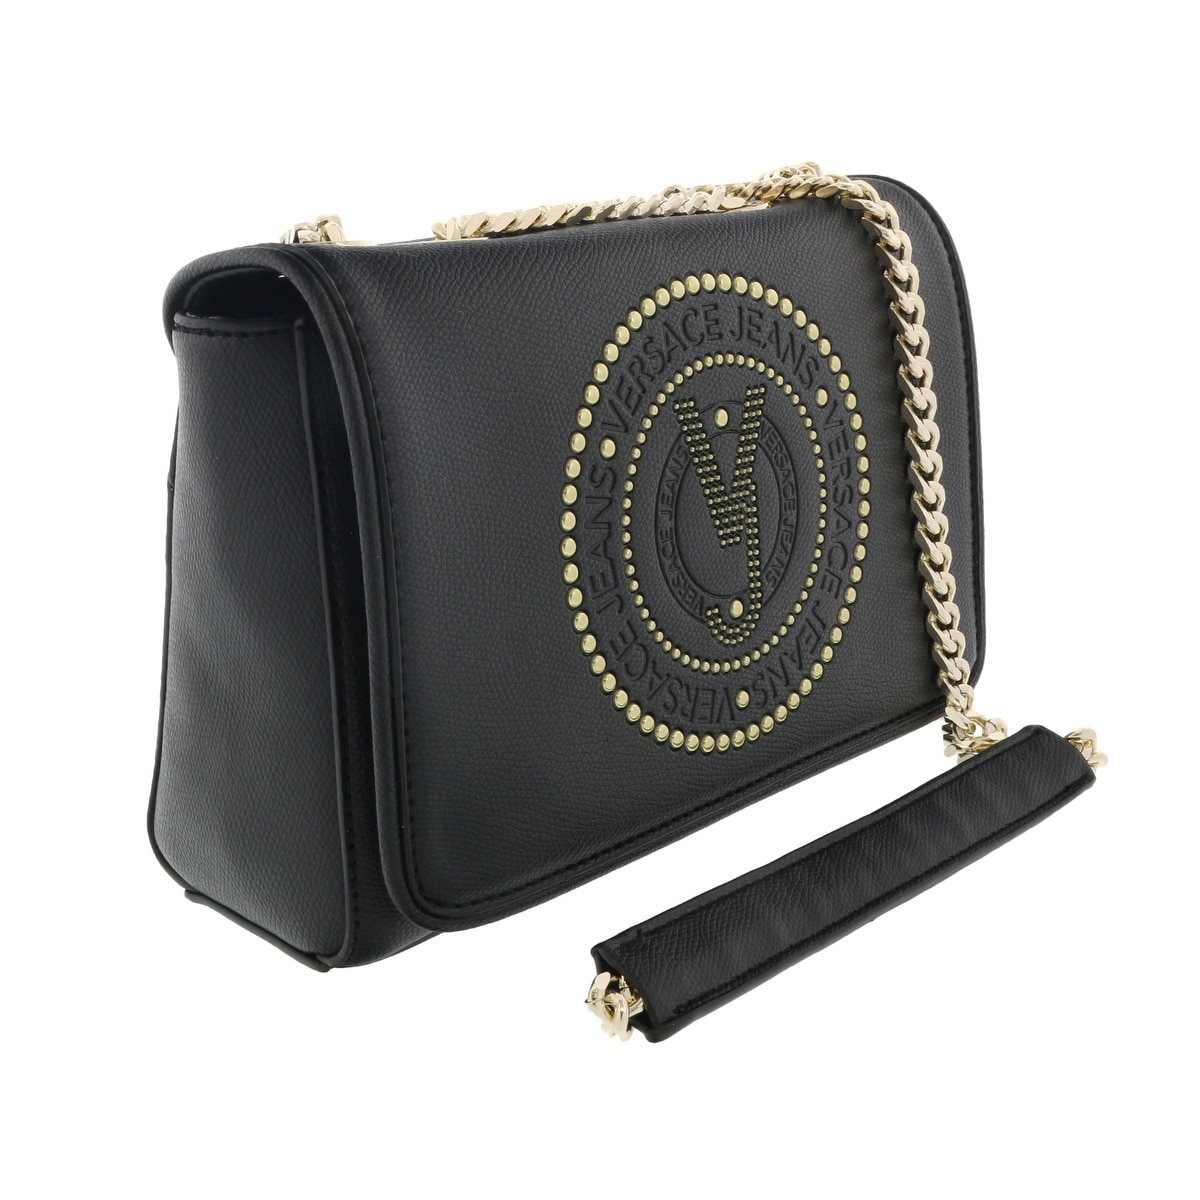 Versace Black Wristlet//Shoudler Bag-EE1VTBBF4 E899